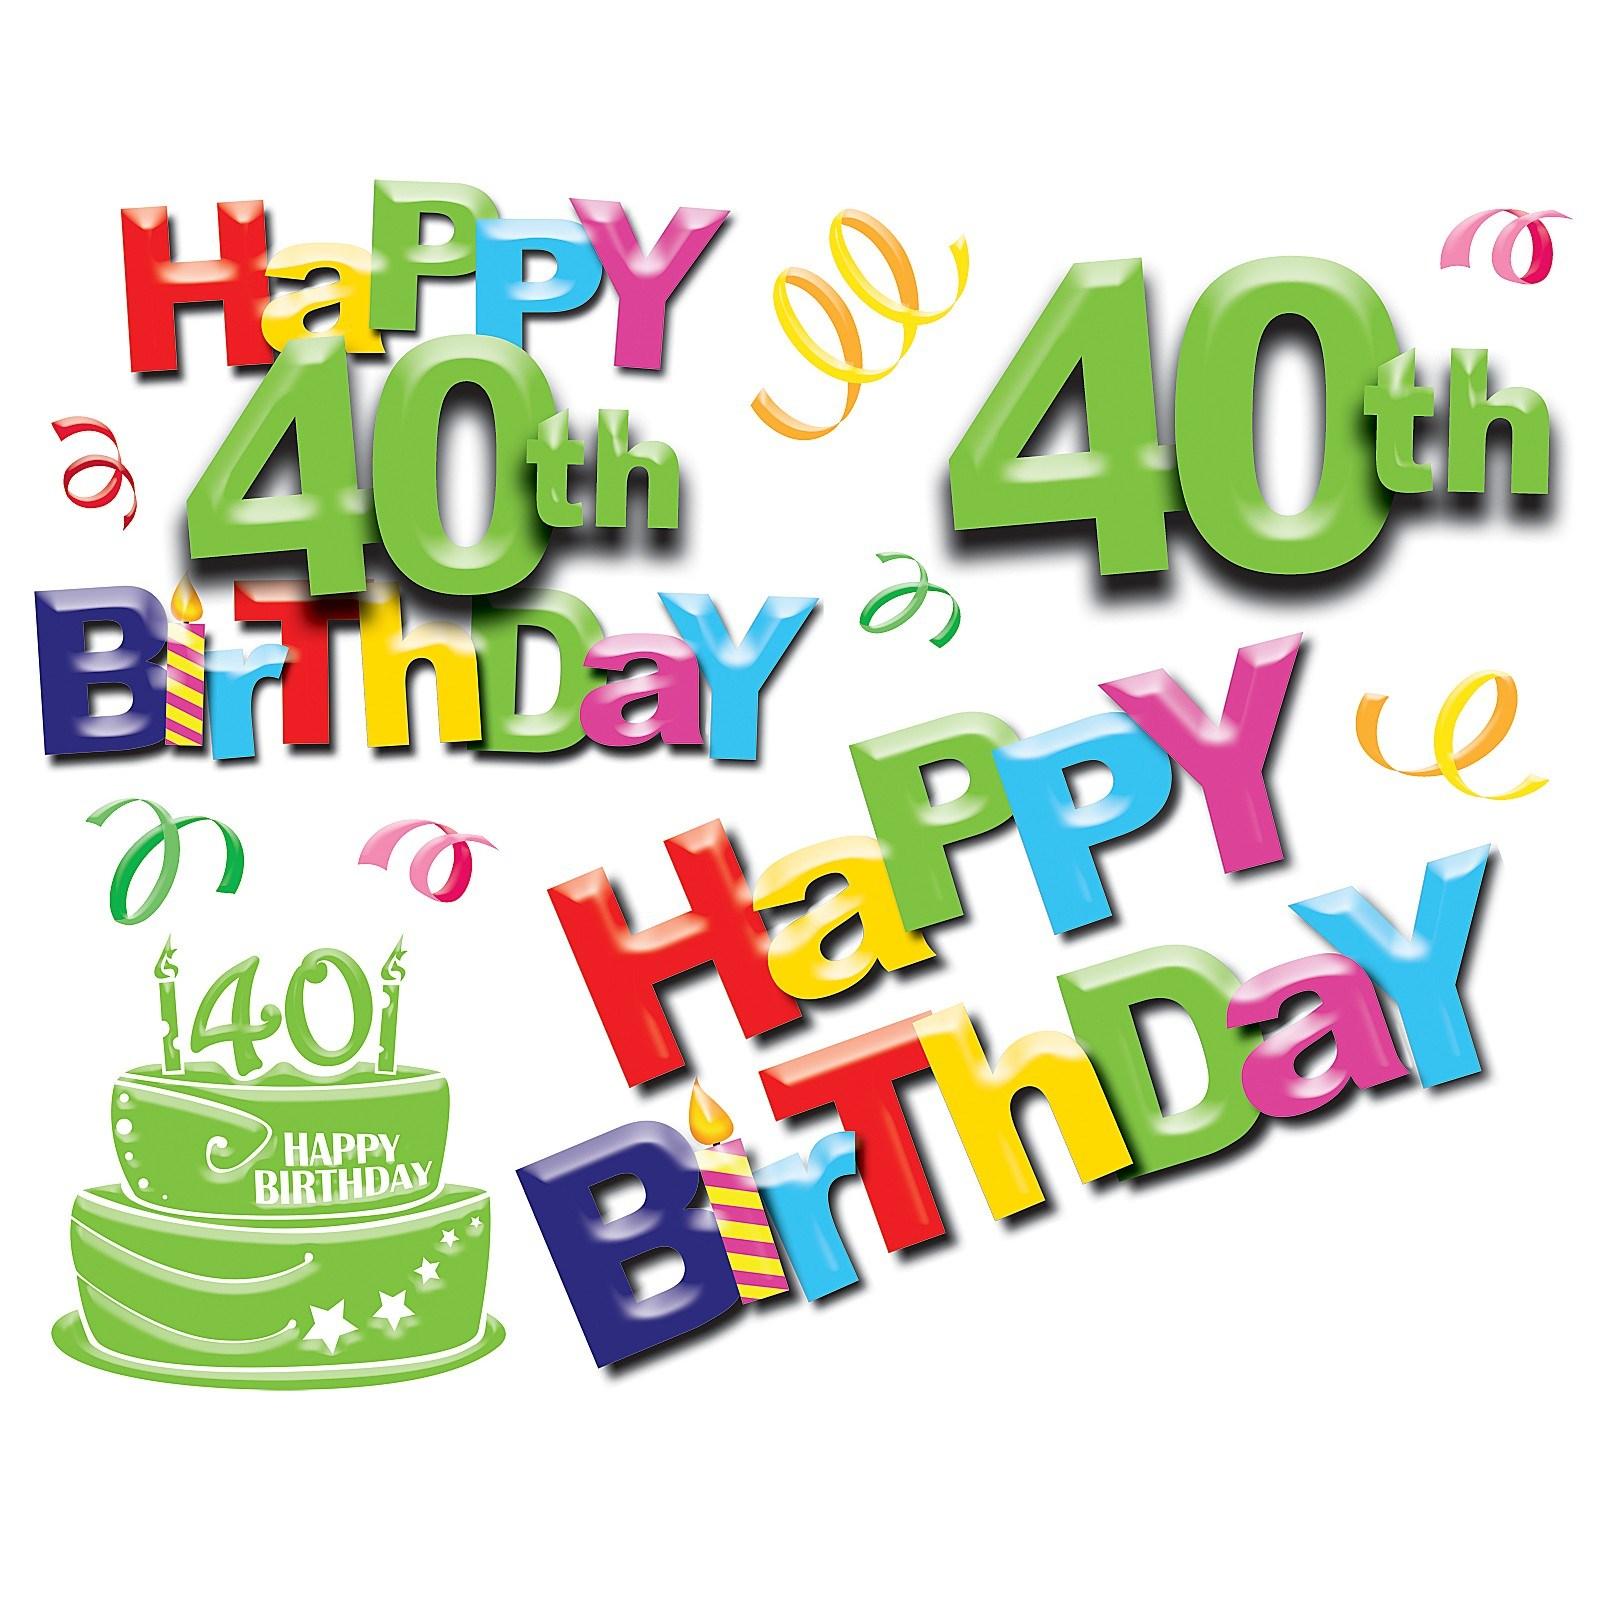 40th birthday clipart 7 » Clipart Portal.